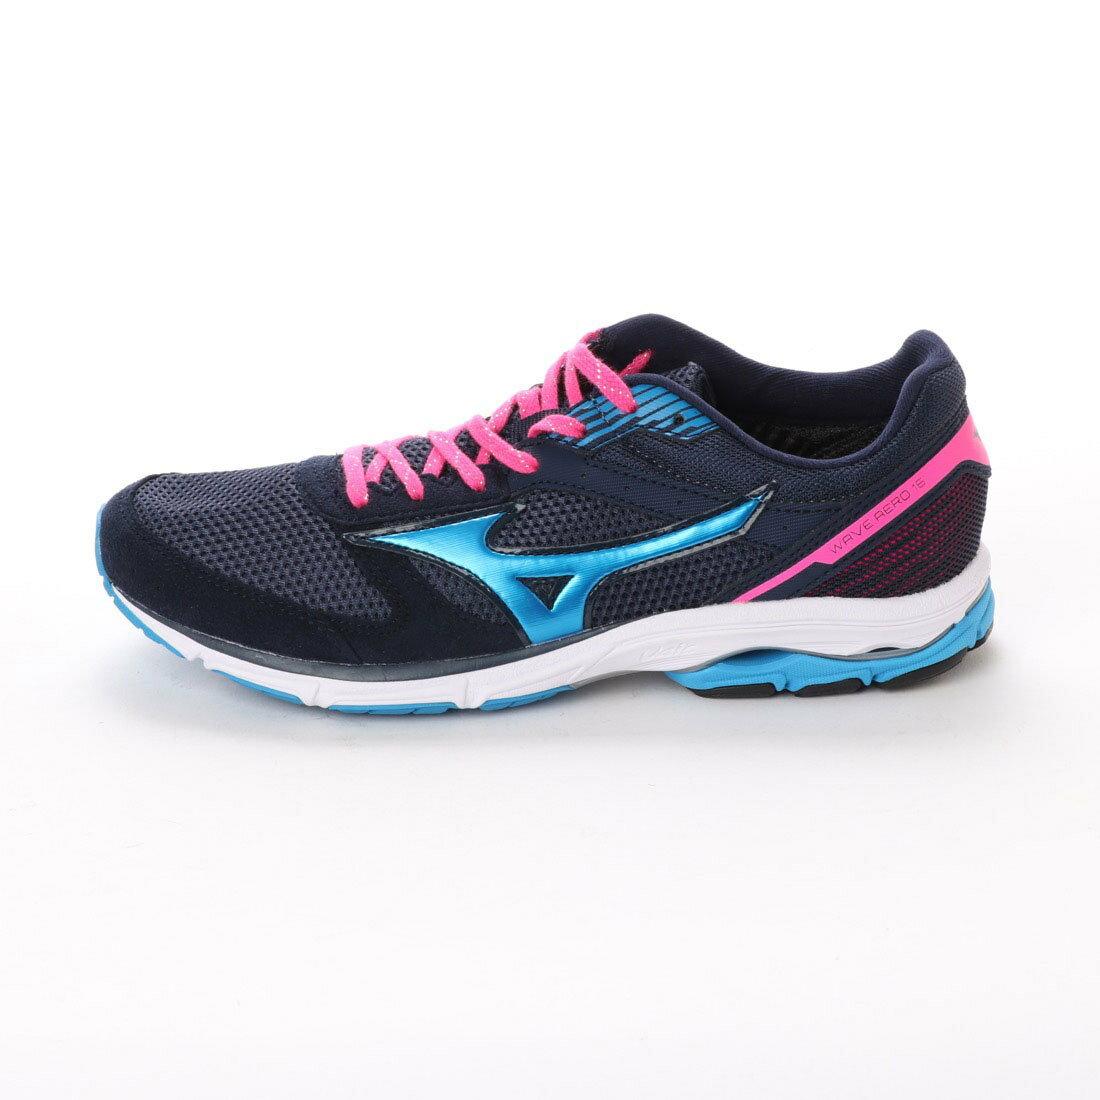 MIZUNO WAVE AERO 16 女鞋 慢跑 馬拉松 休閒 籃 粉紅【運動世界】J1GB173525